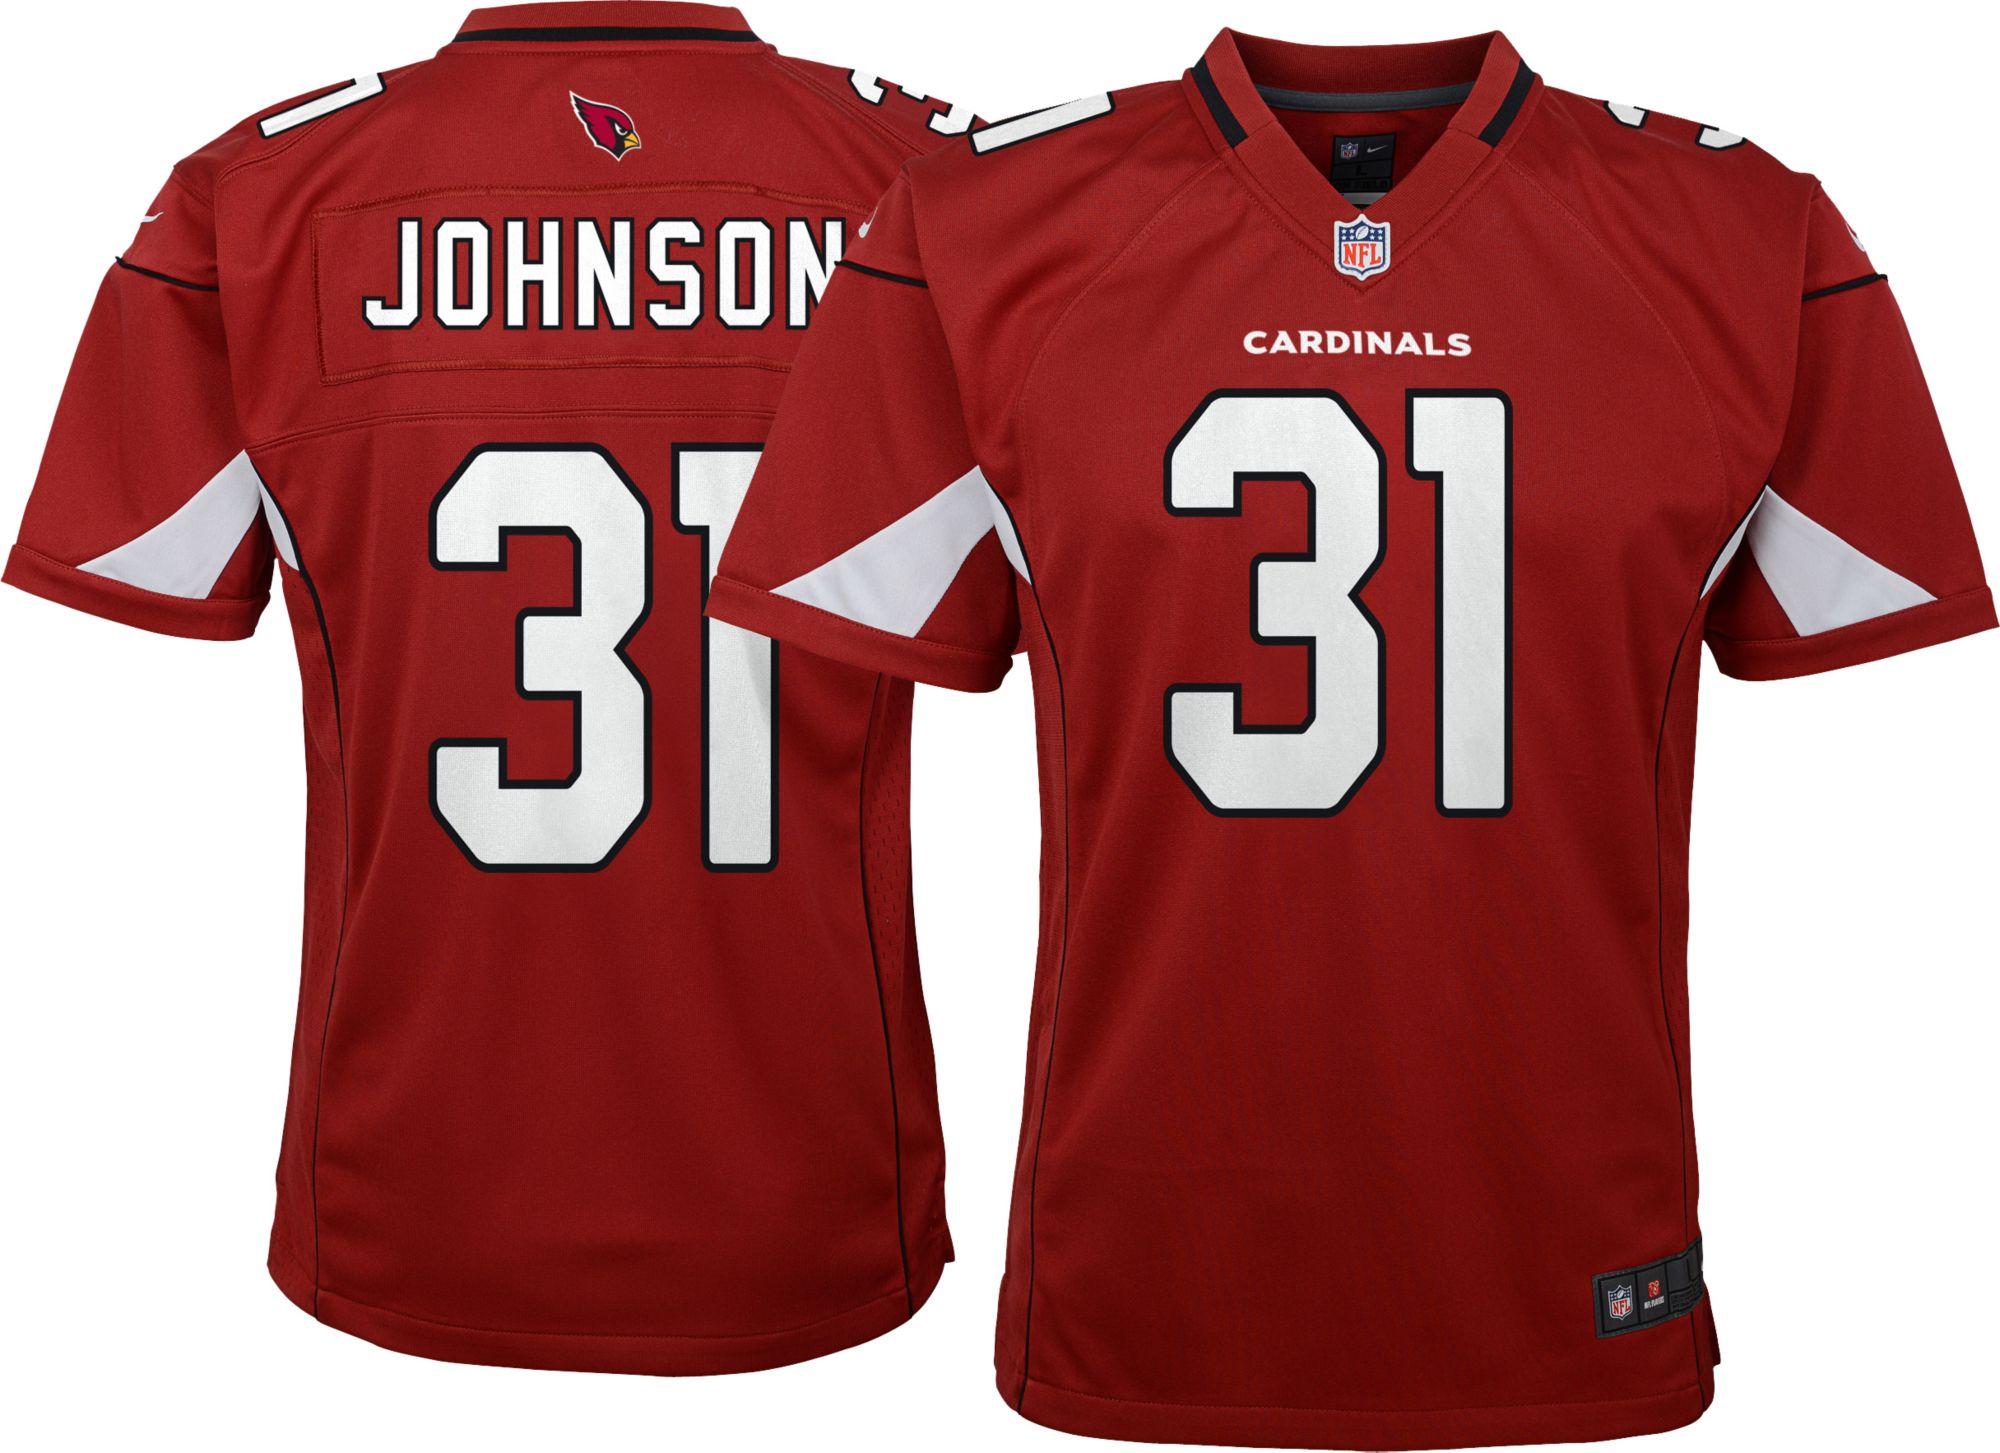 official photos c2b11 9d2c1 david johnson stitched jersey